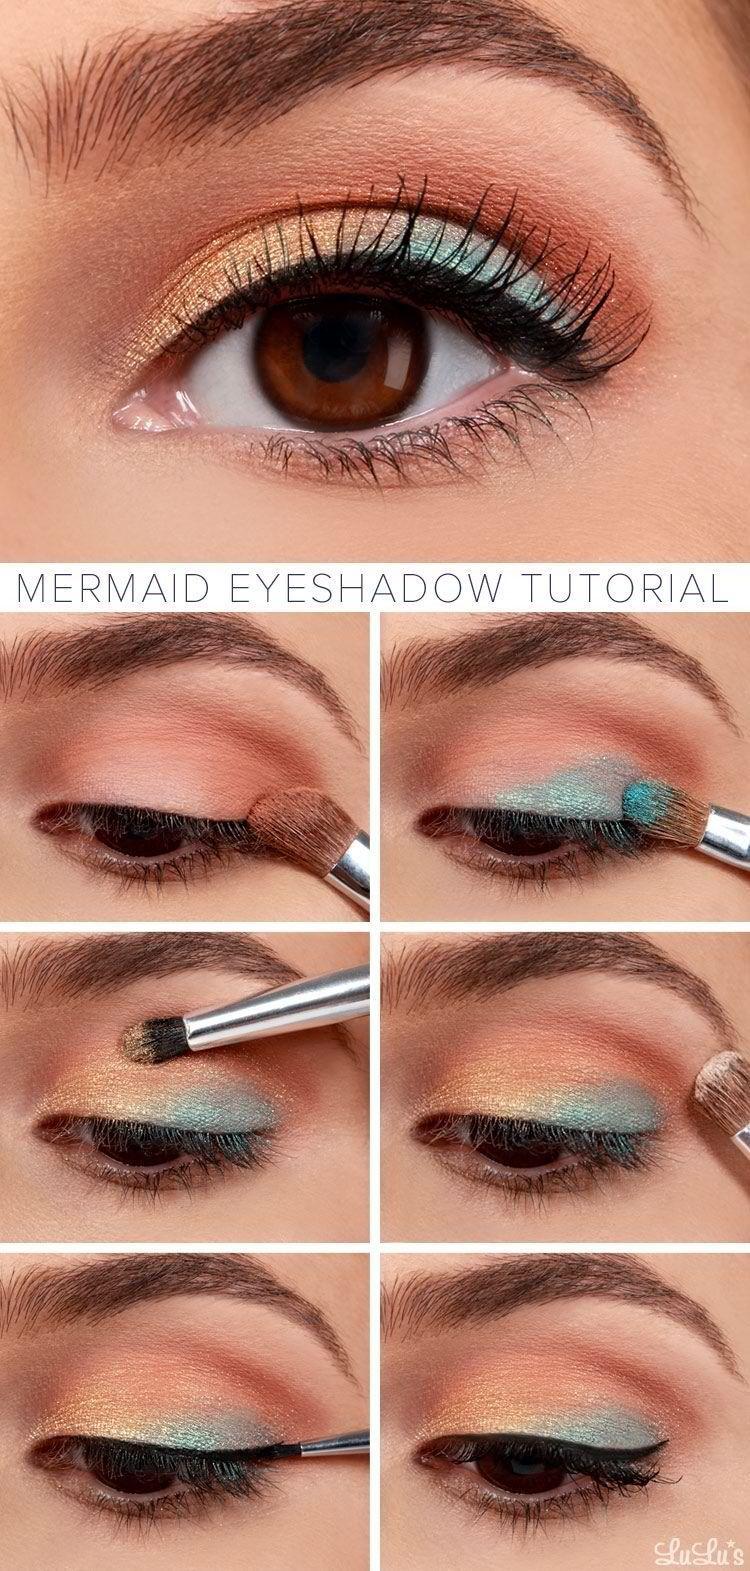 can eye makeup give you a headache eye makeup video in